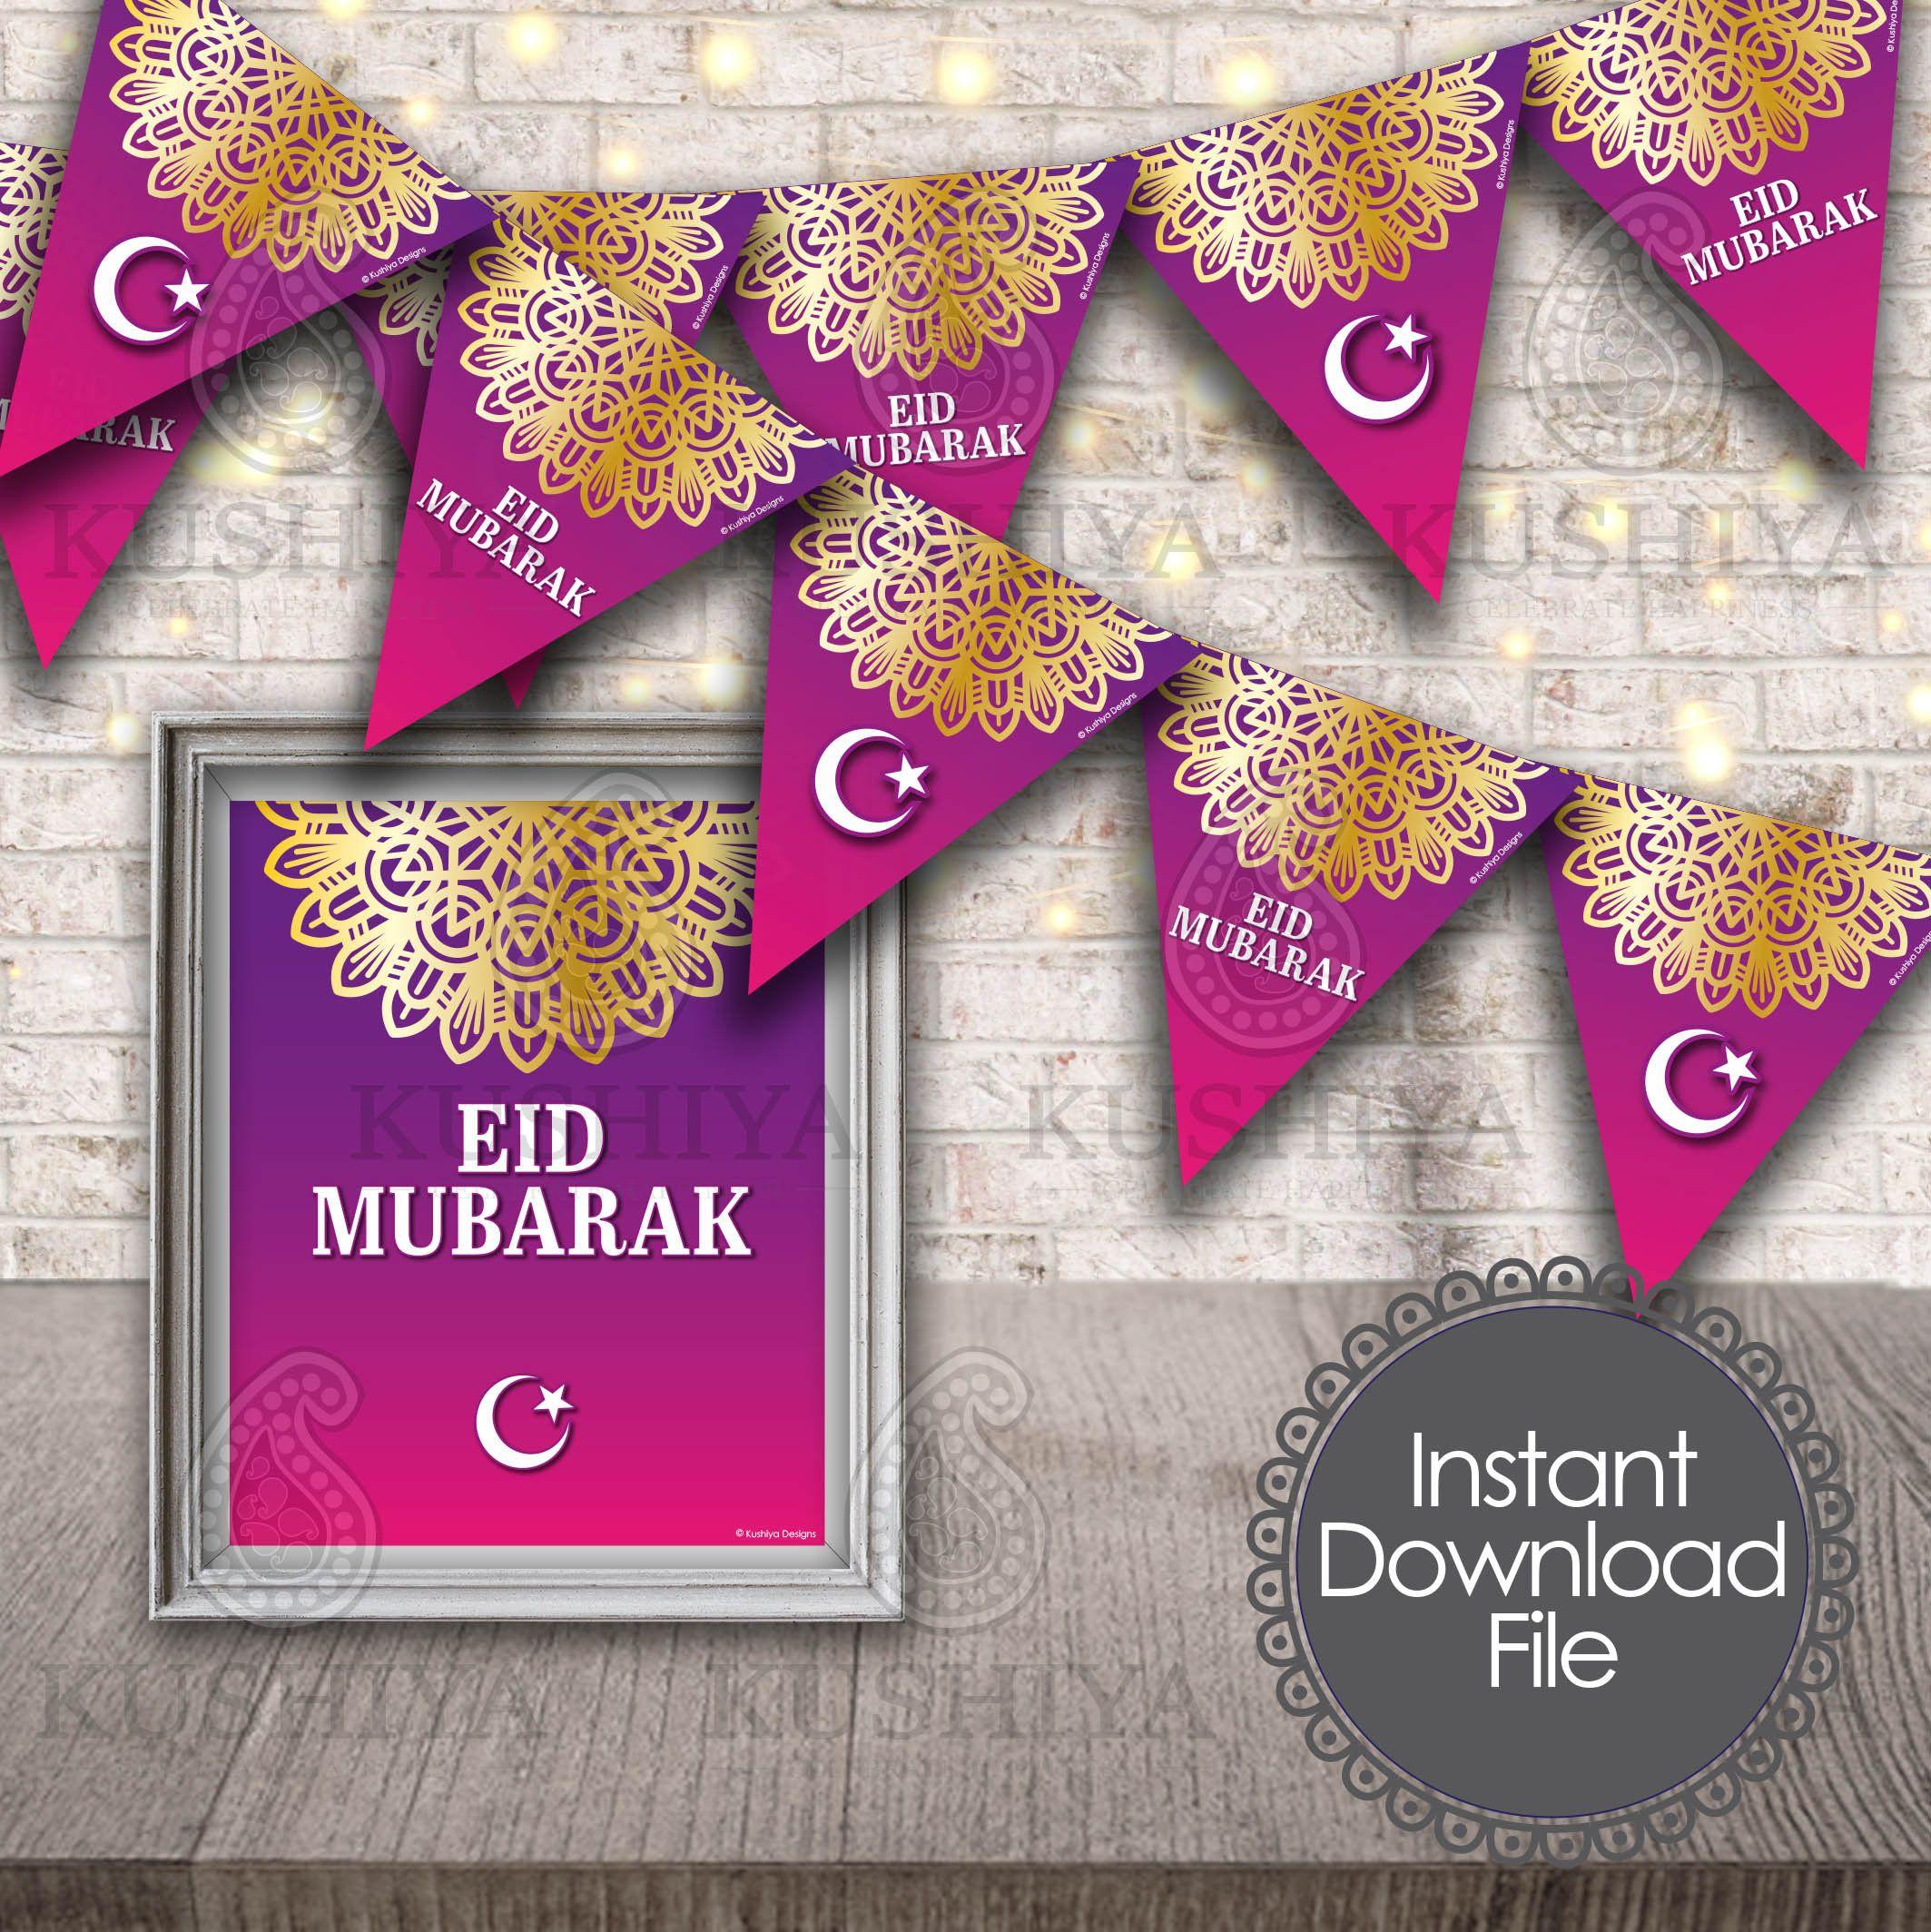 eid mubarak bunting flags  decorative print  eid